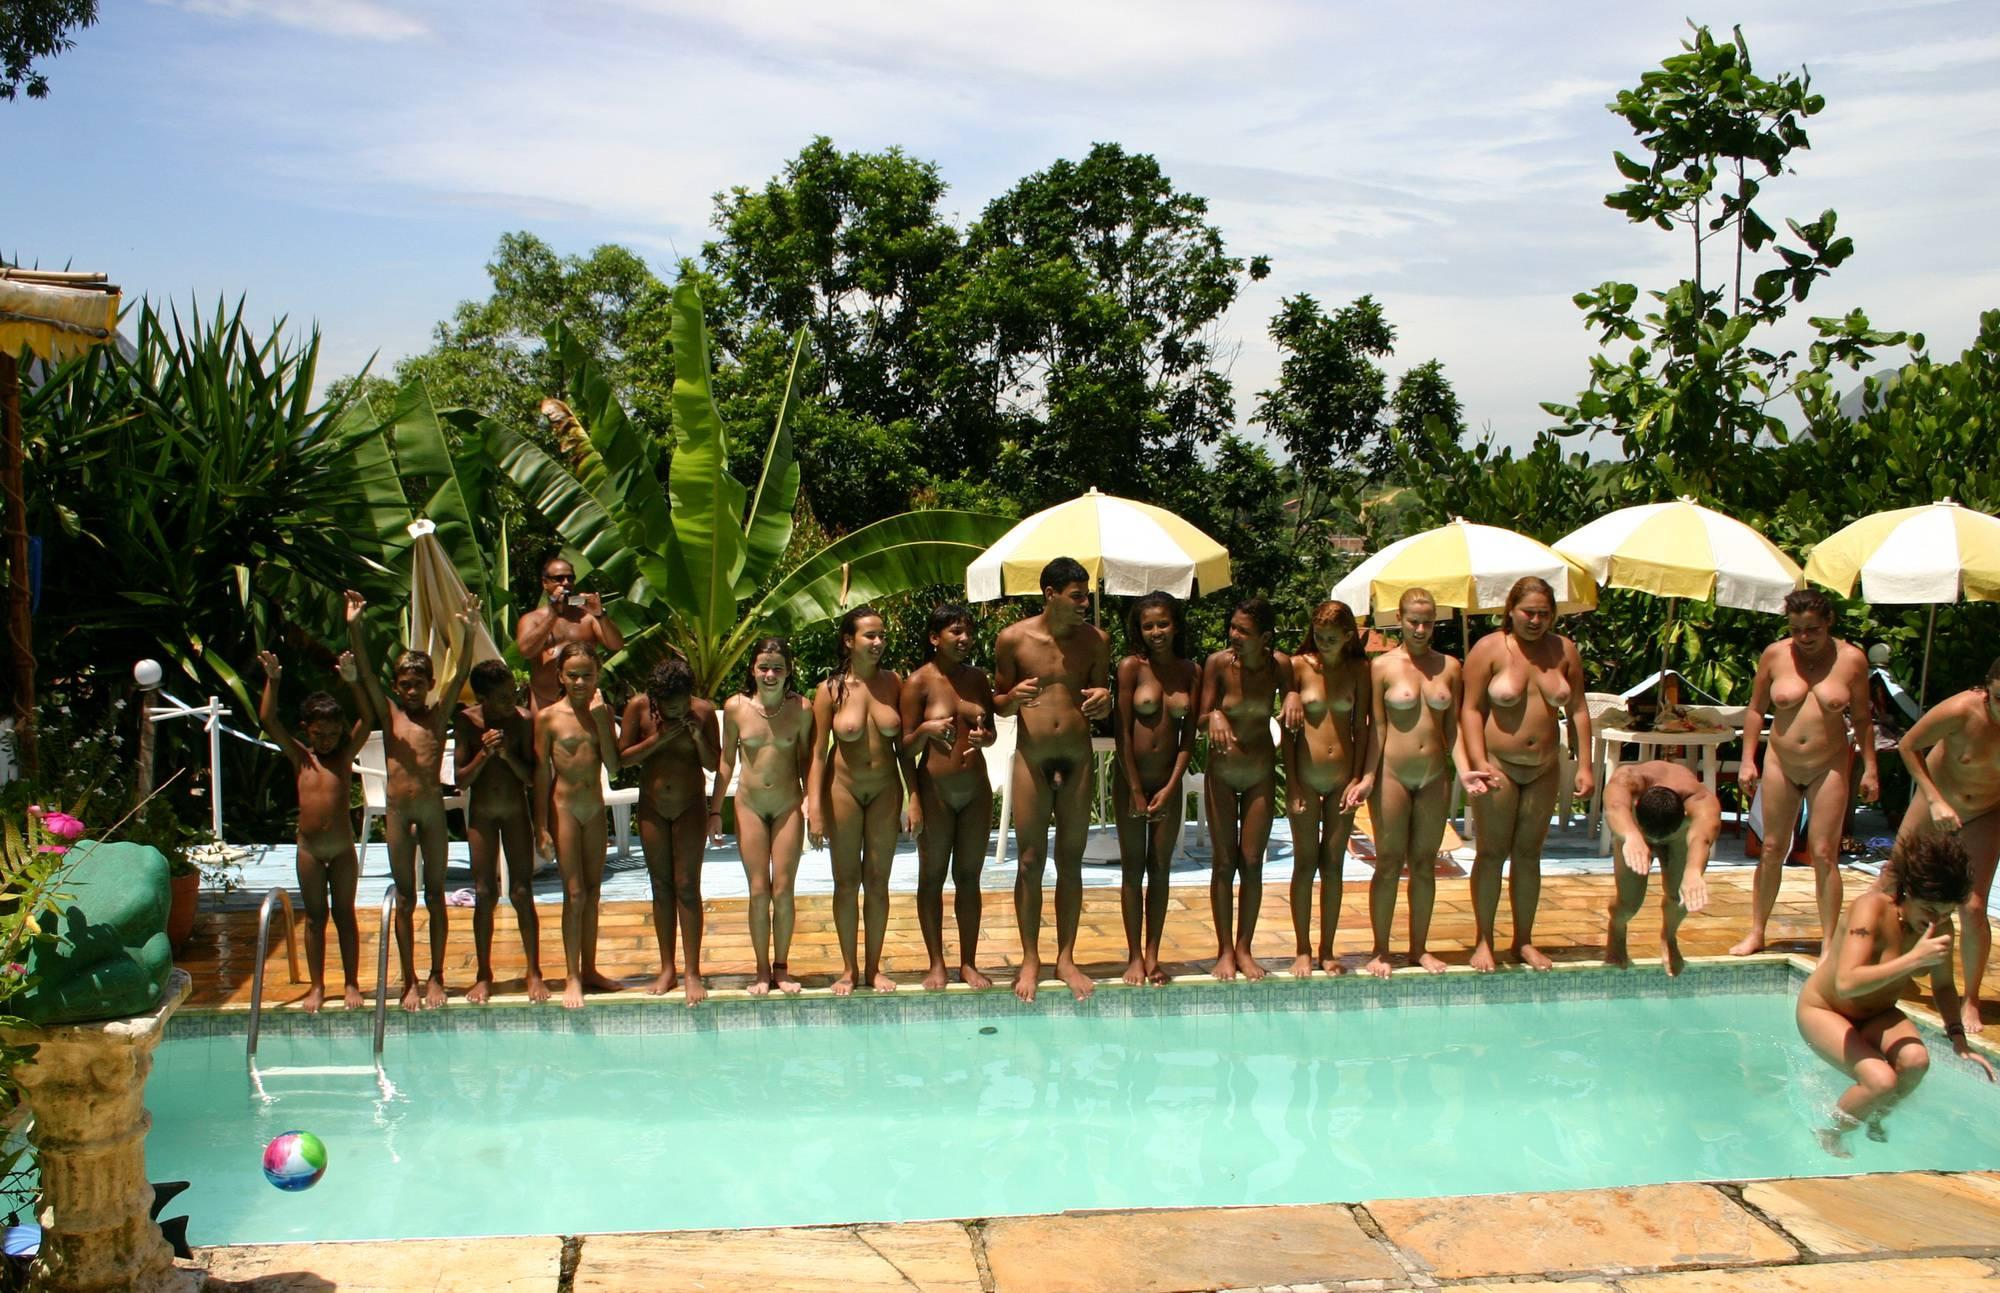 Nudist Gallery Brazilian Pool Line Group - 2